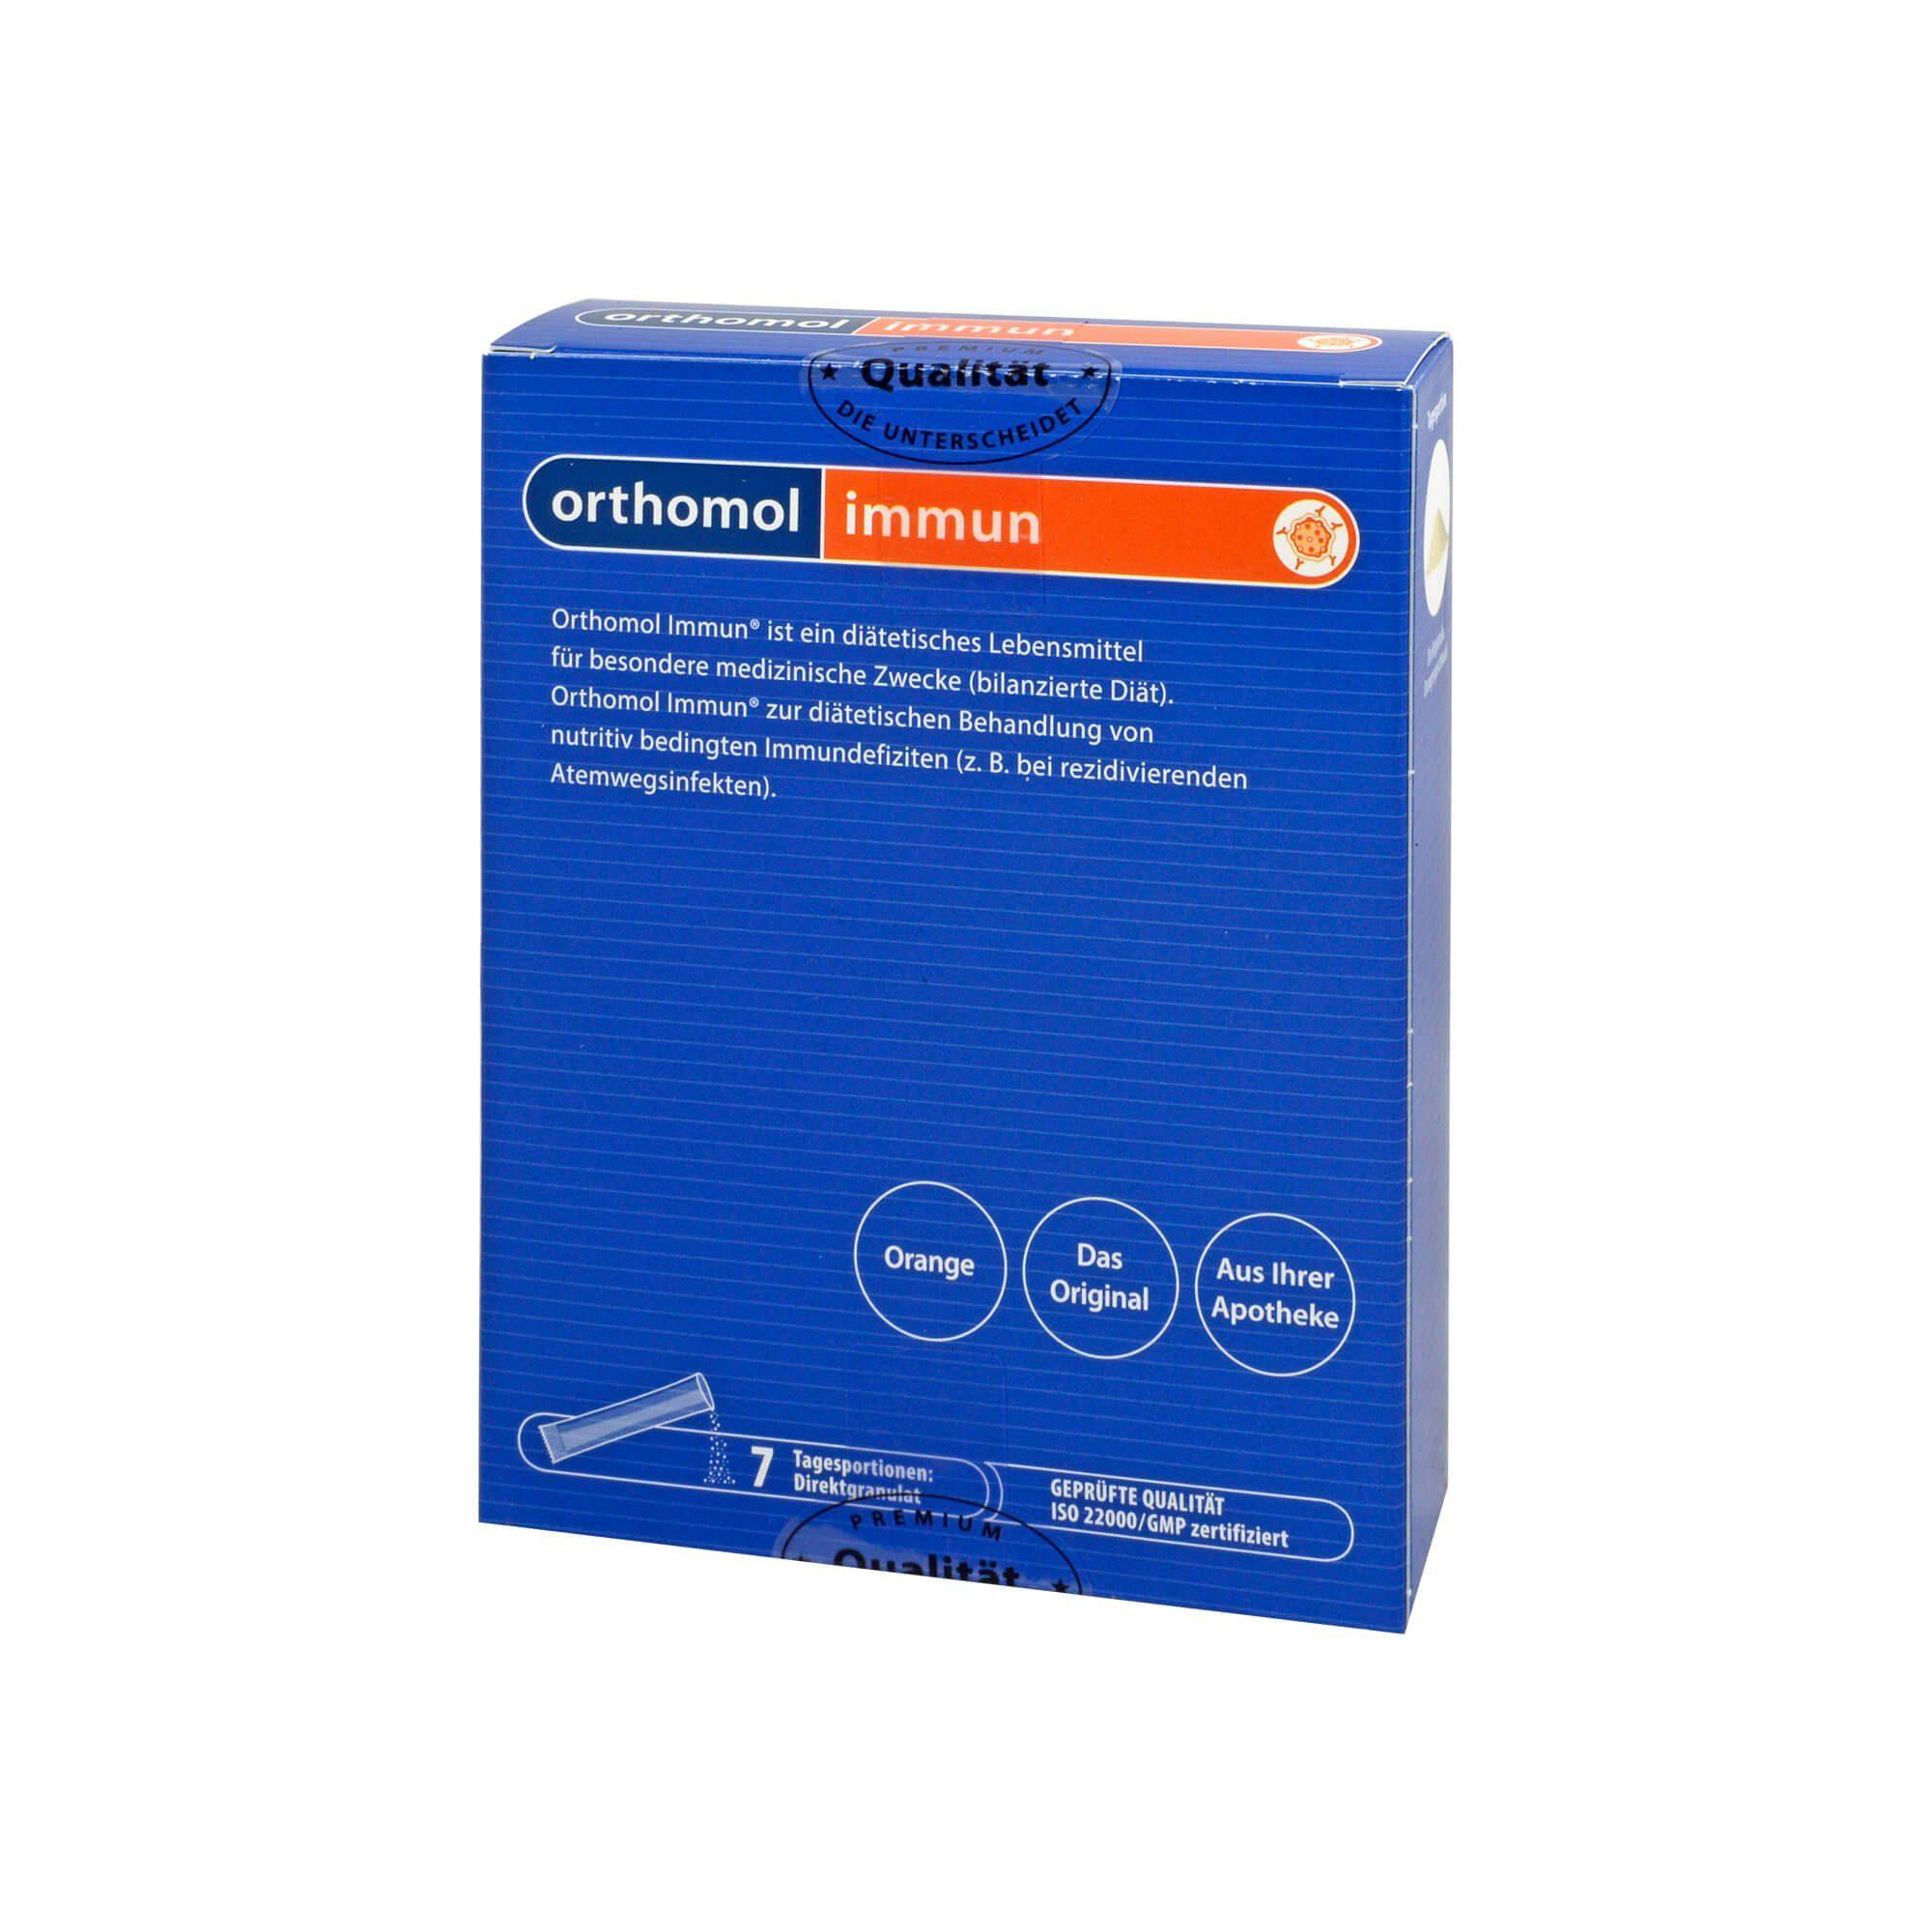 Orthomol Immun Direktgranulat Orange, 7 St